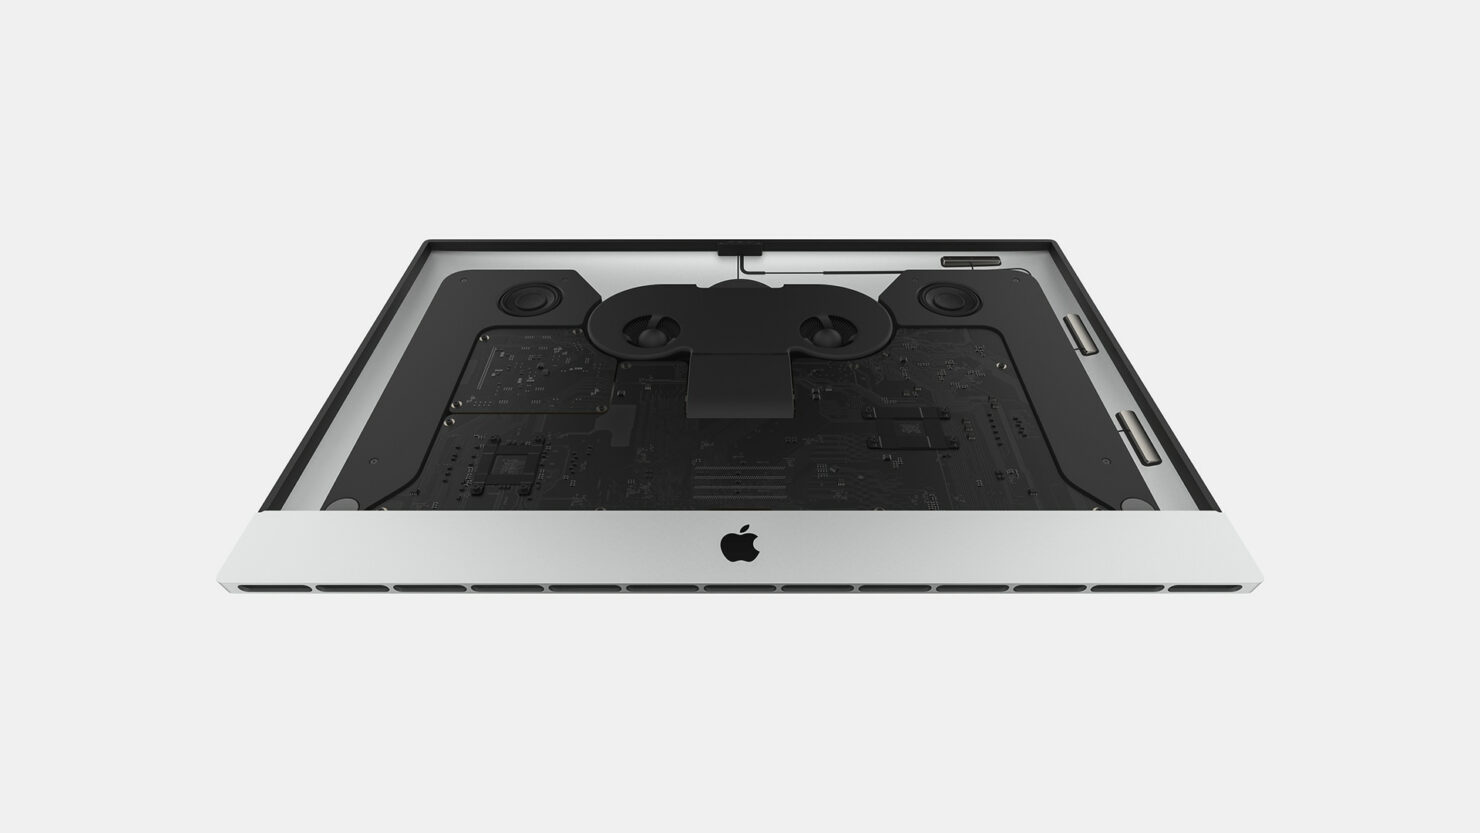 imac-concept-resembling-pro-display-xdr-3